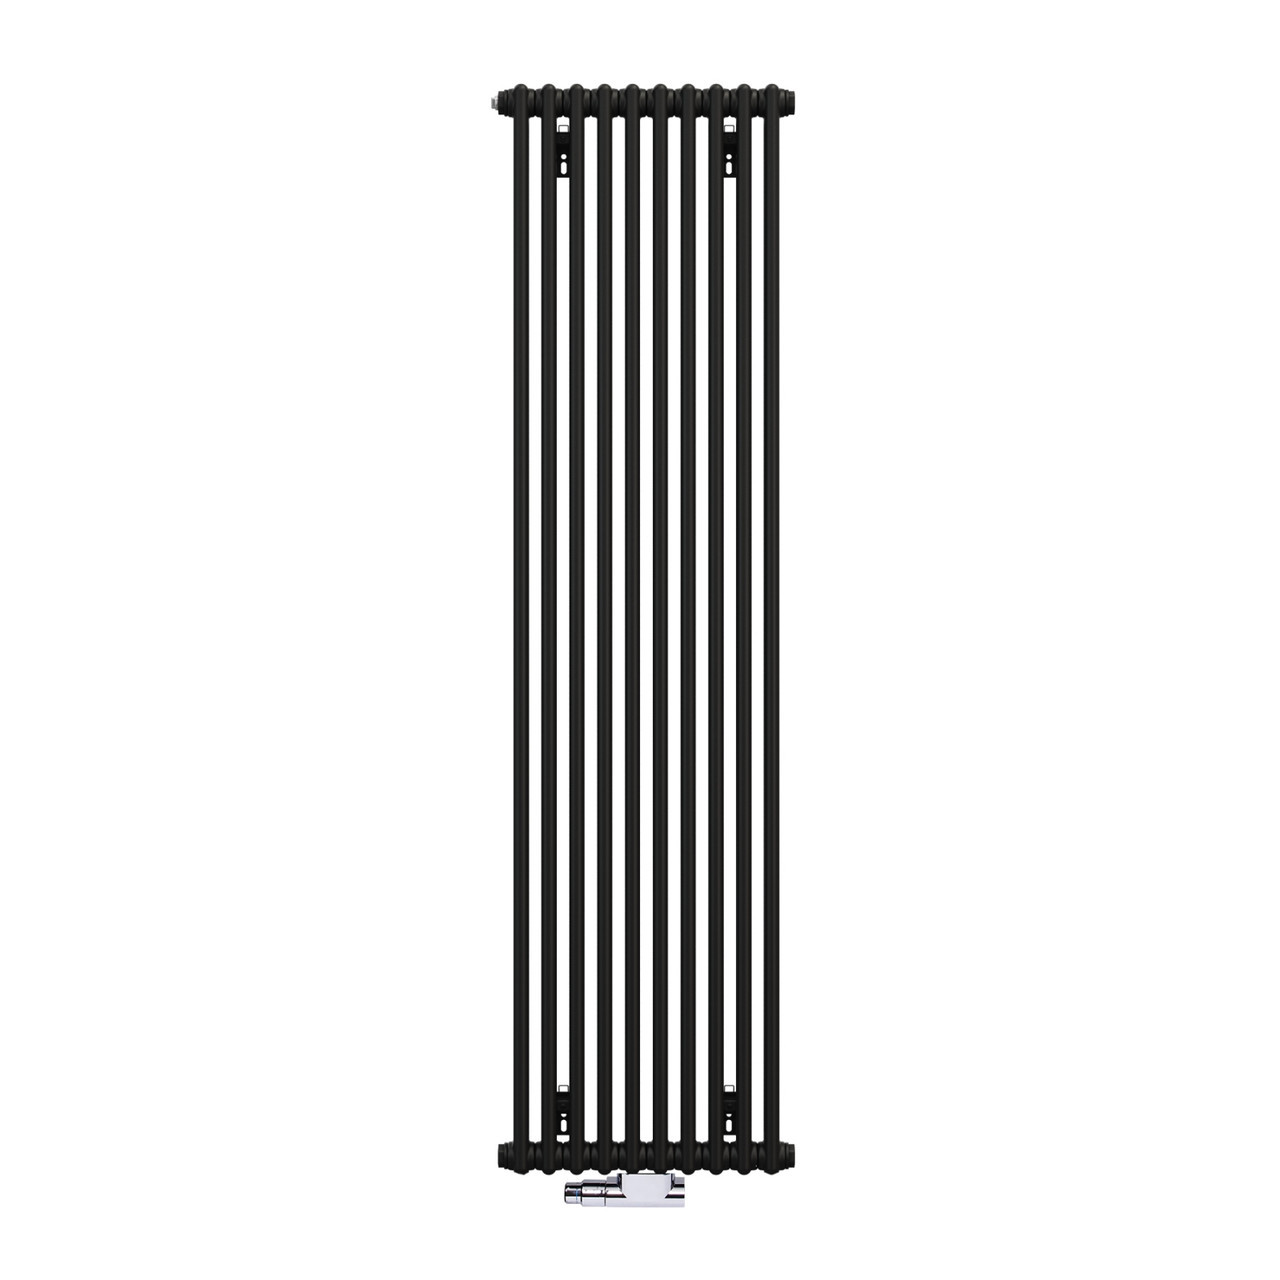 Zehnder Charleston Радиатор центрального отопления 460 x 1792, Traffik black арт.2180-10-9217-3470-SMB